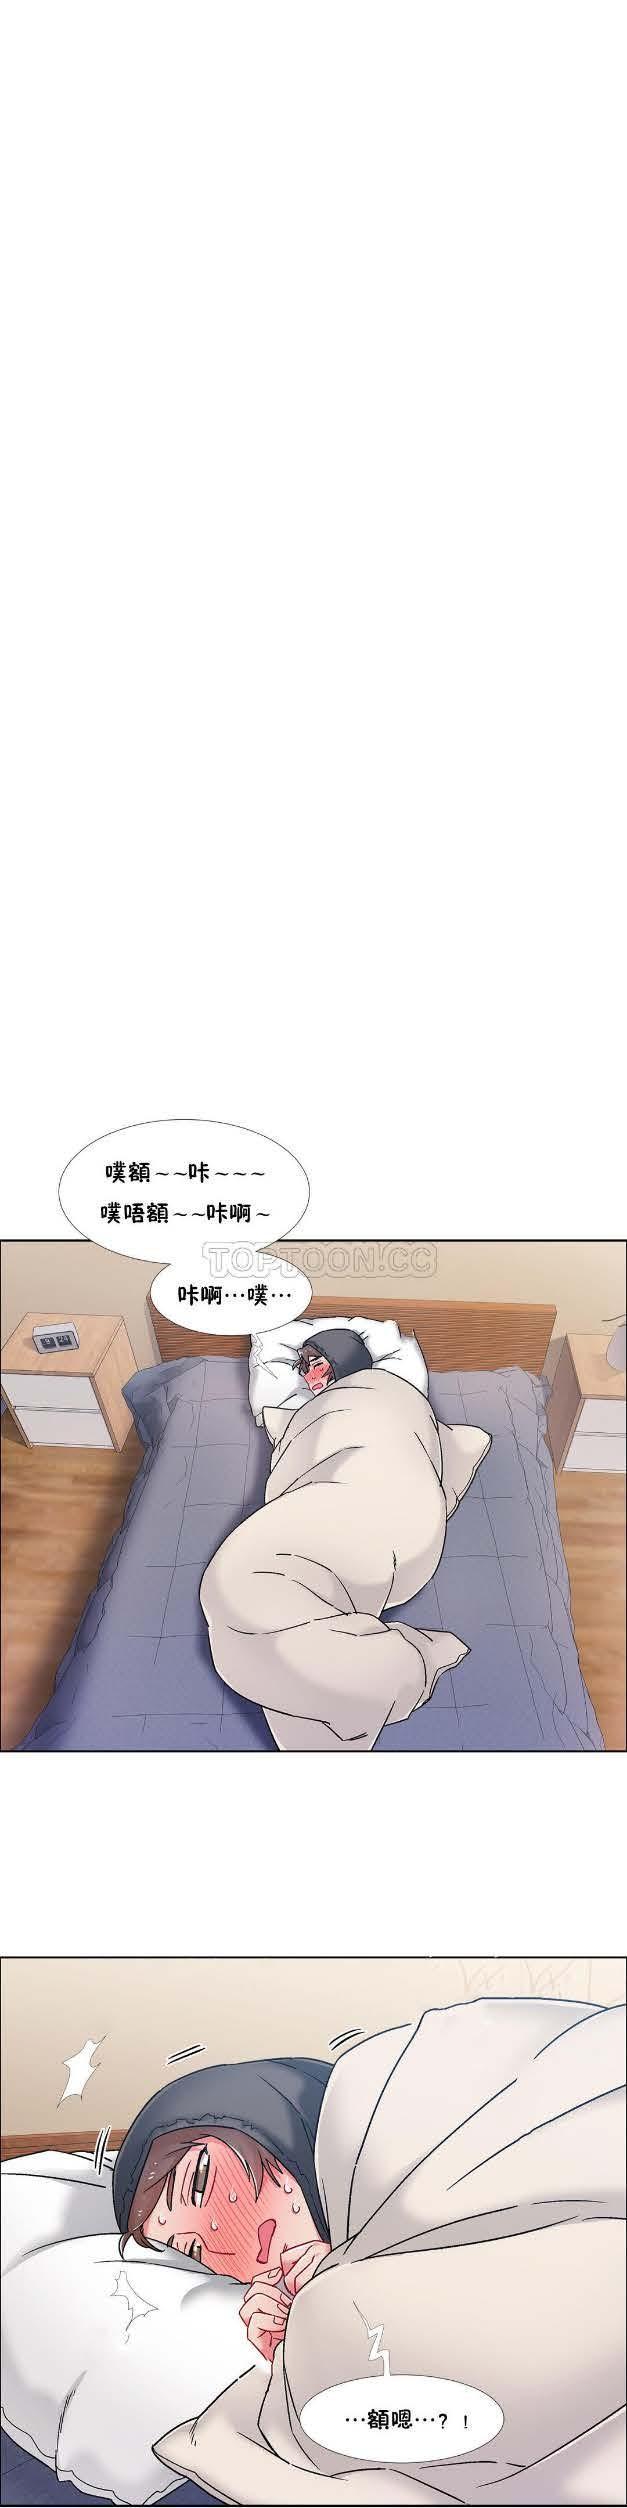 [Studio Wannabe] Rental Girls | 出租女郎 Ch. 33-58 [Chinese]  第二季 完结 287